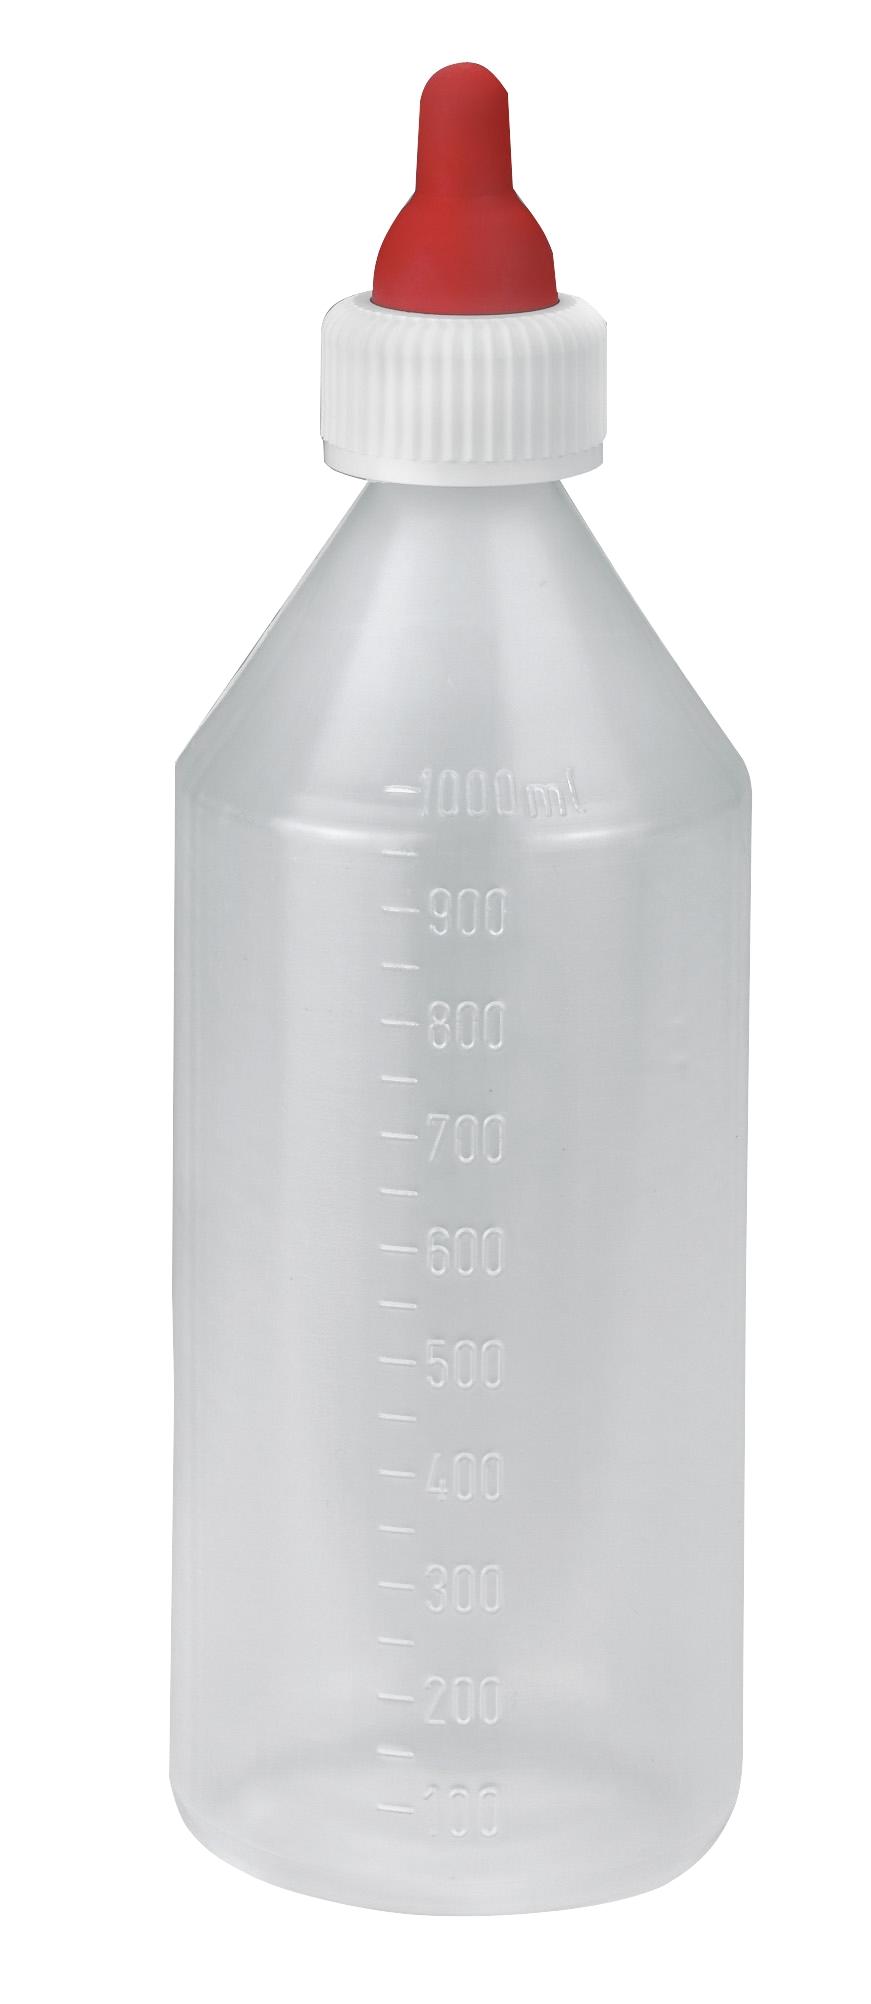 Lam/veulen speenfles flexi 1000 ml